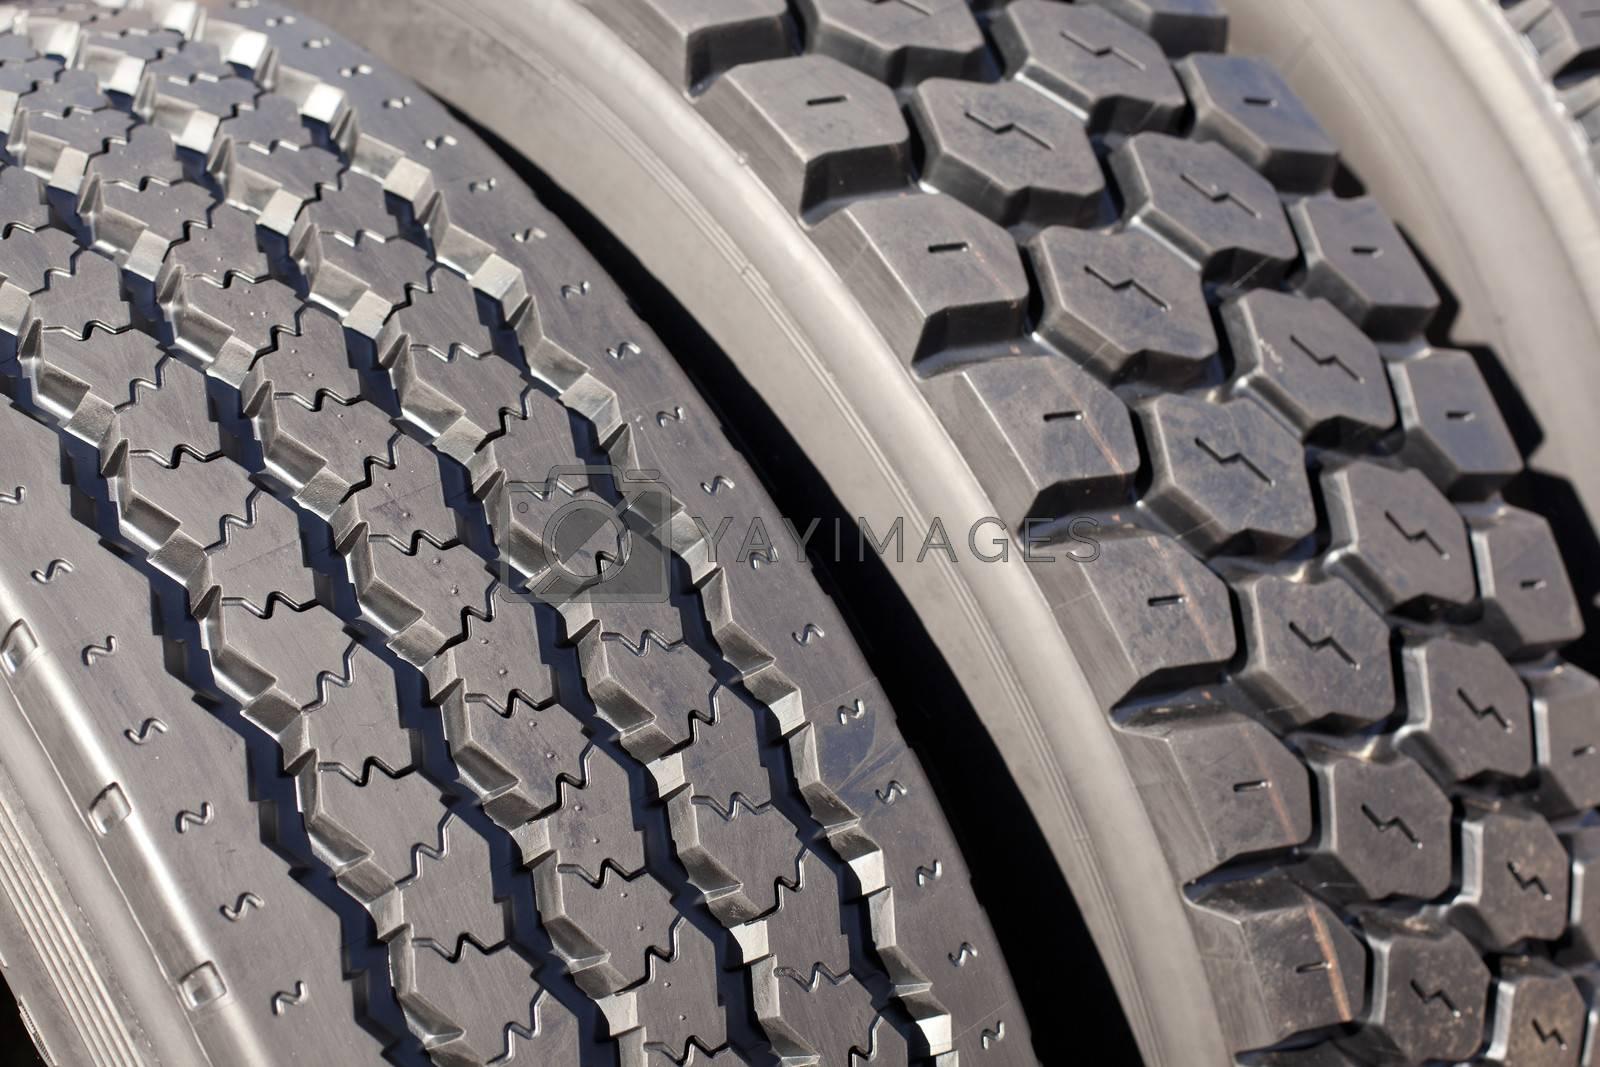 New black tires